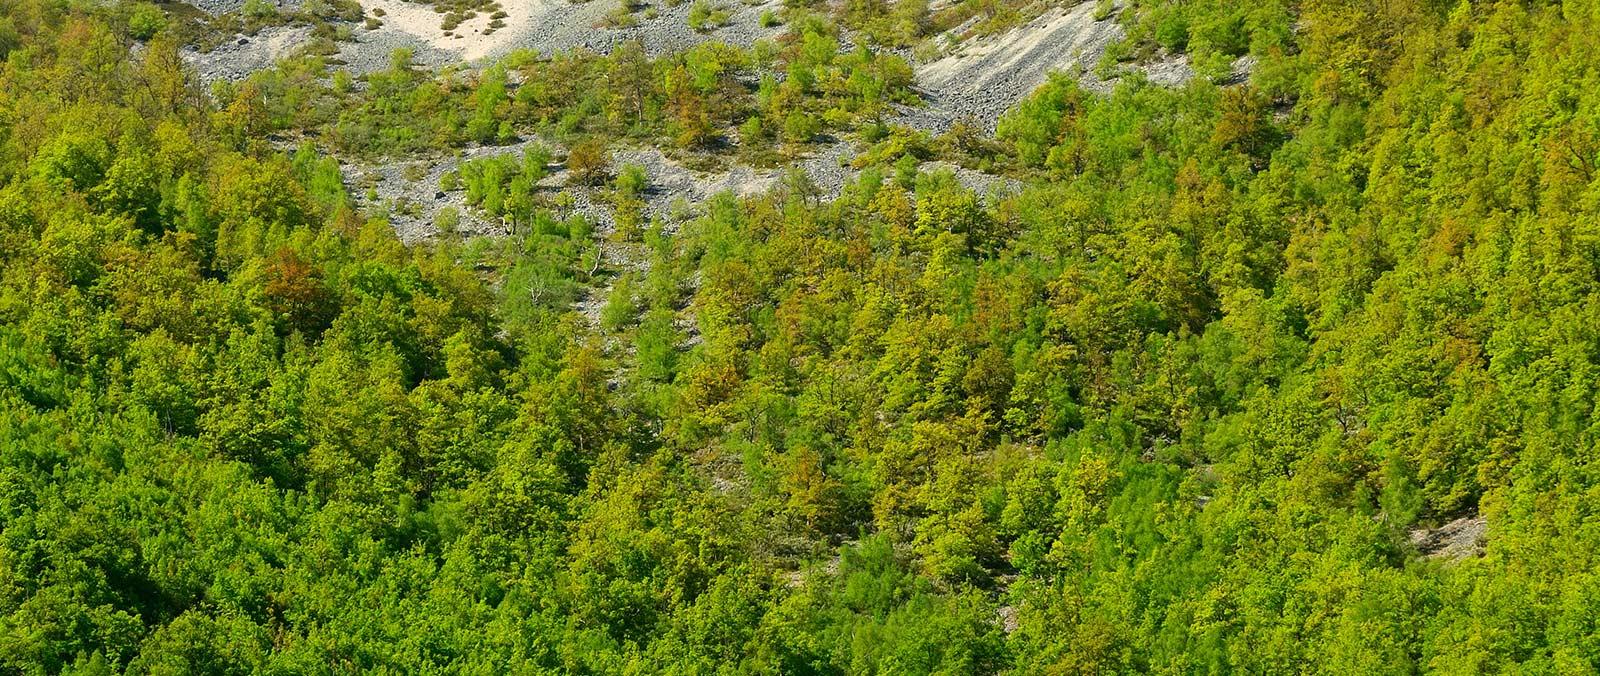 Miel de Bosque - Ería de Valles